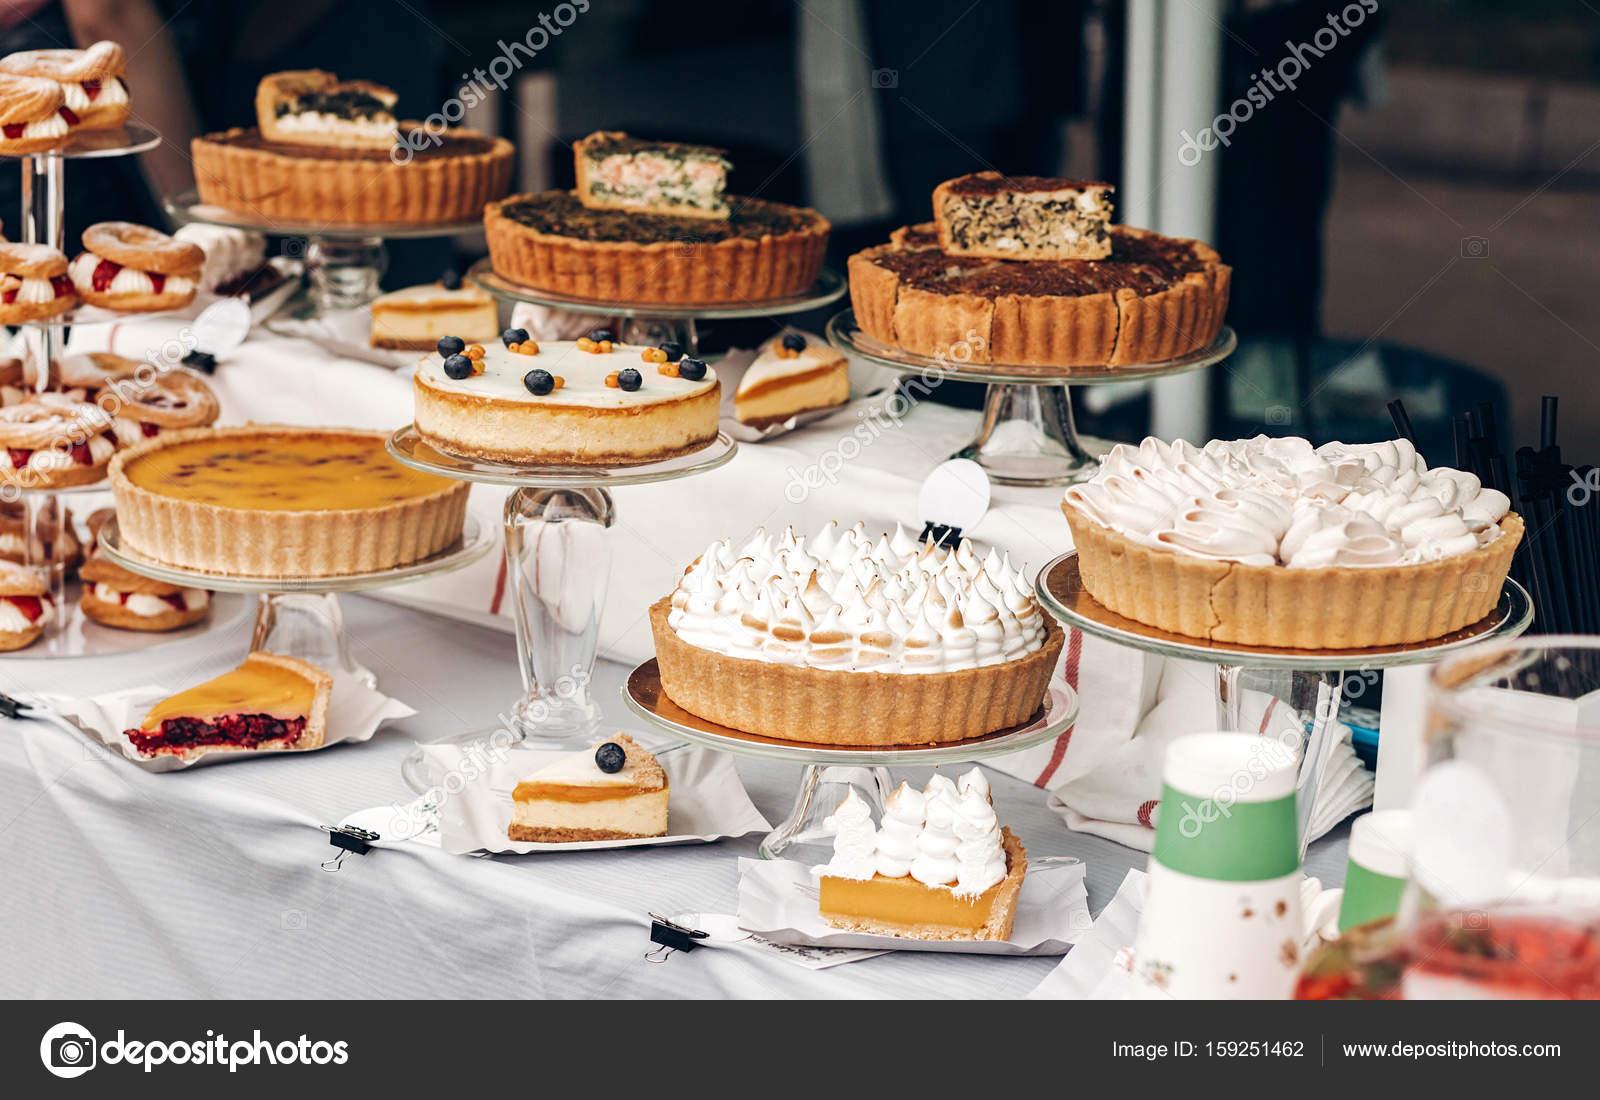 Leckere Kuchen Und Torten Stockfoto C Sonyachny 159251462